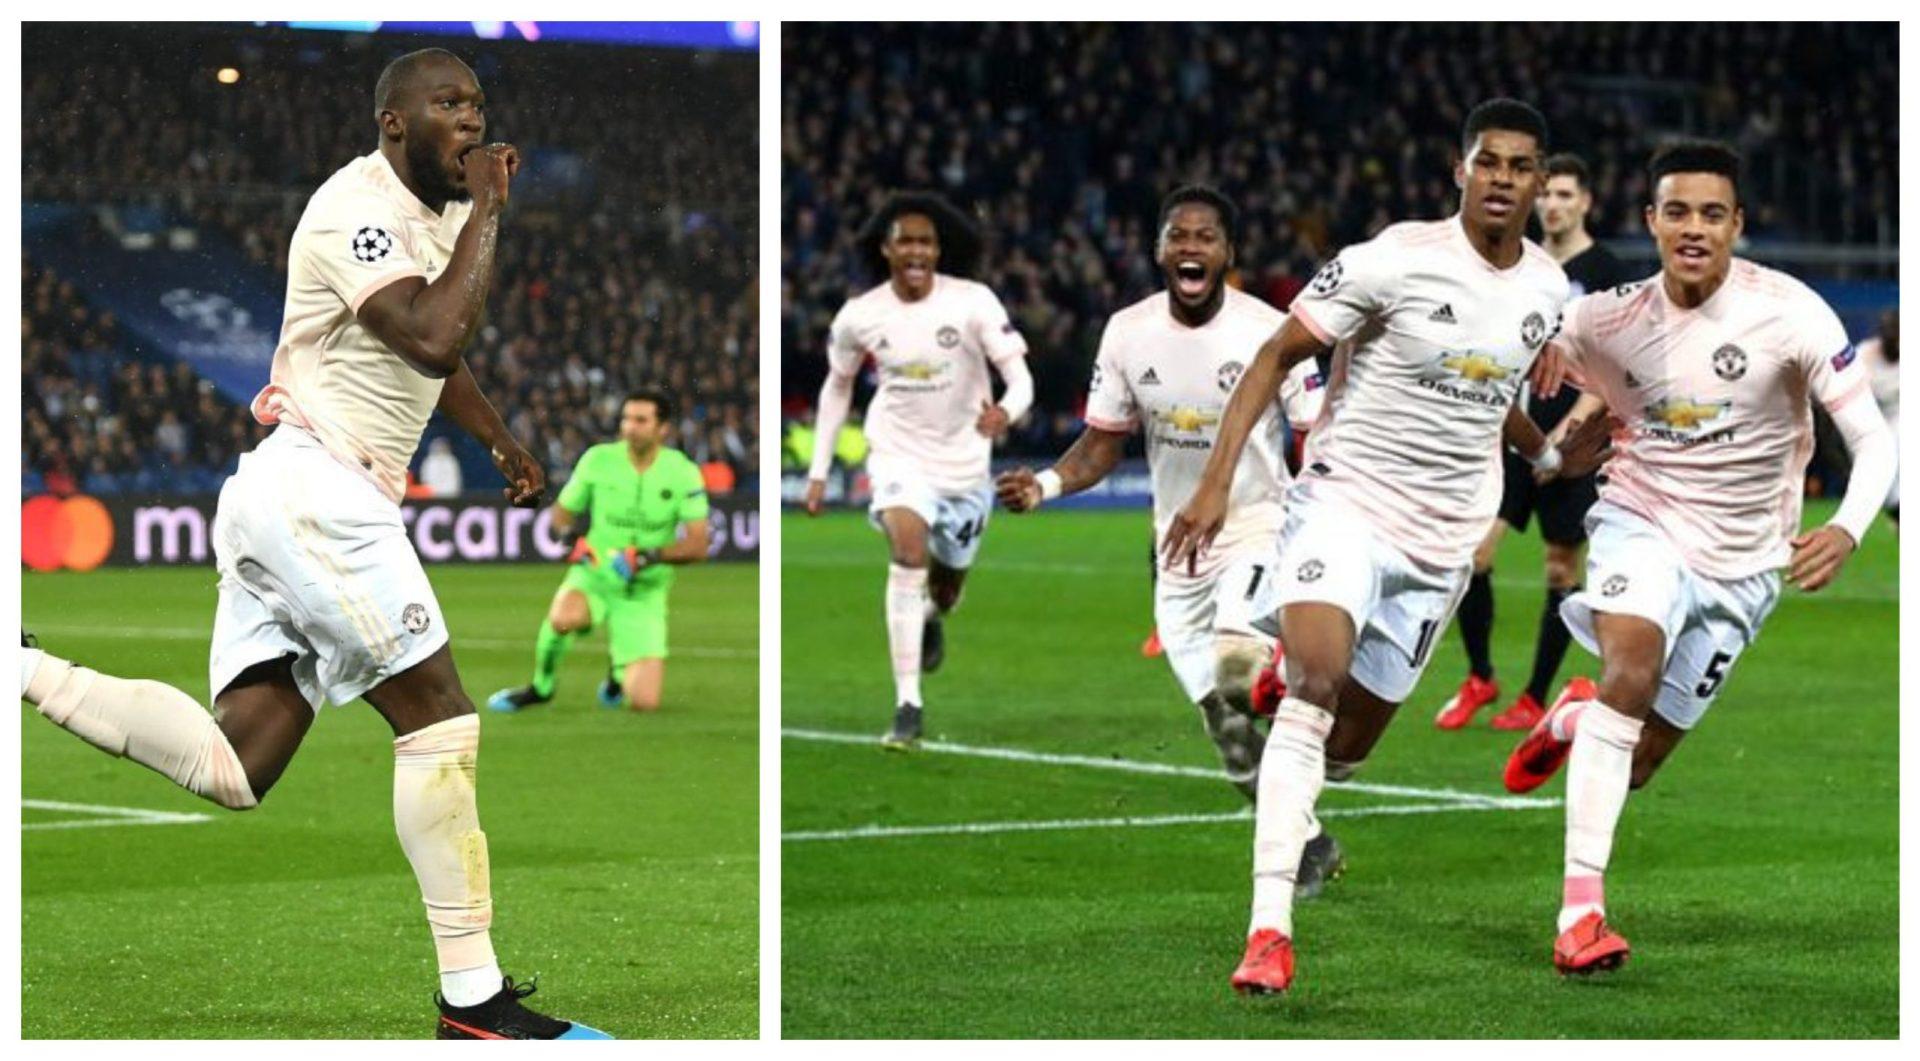 """Lukaku is Selfless""-Rashford tweets behind the scenes story of Man Utd's famous win over PSG - THE SPORTS ROOM"